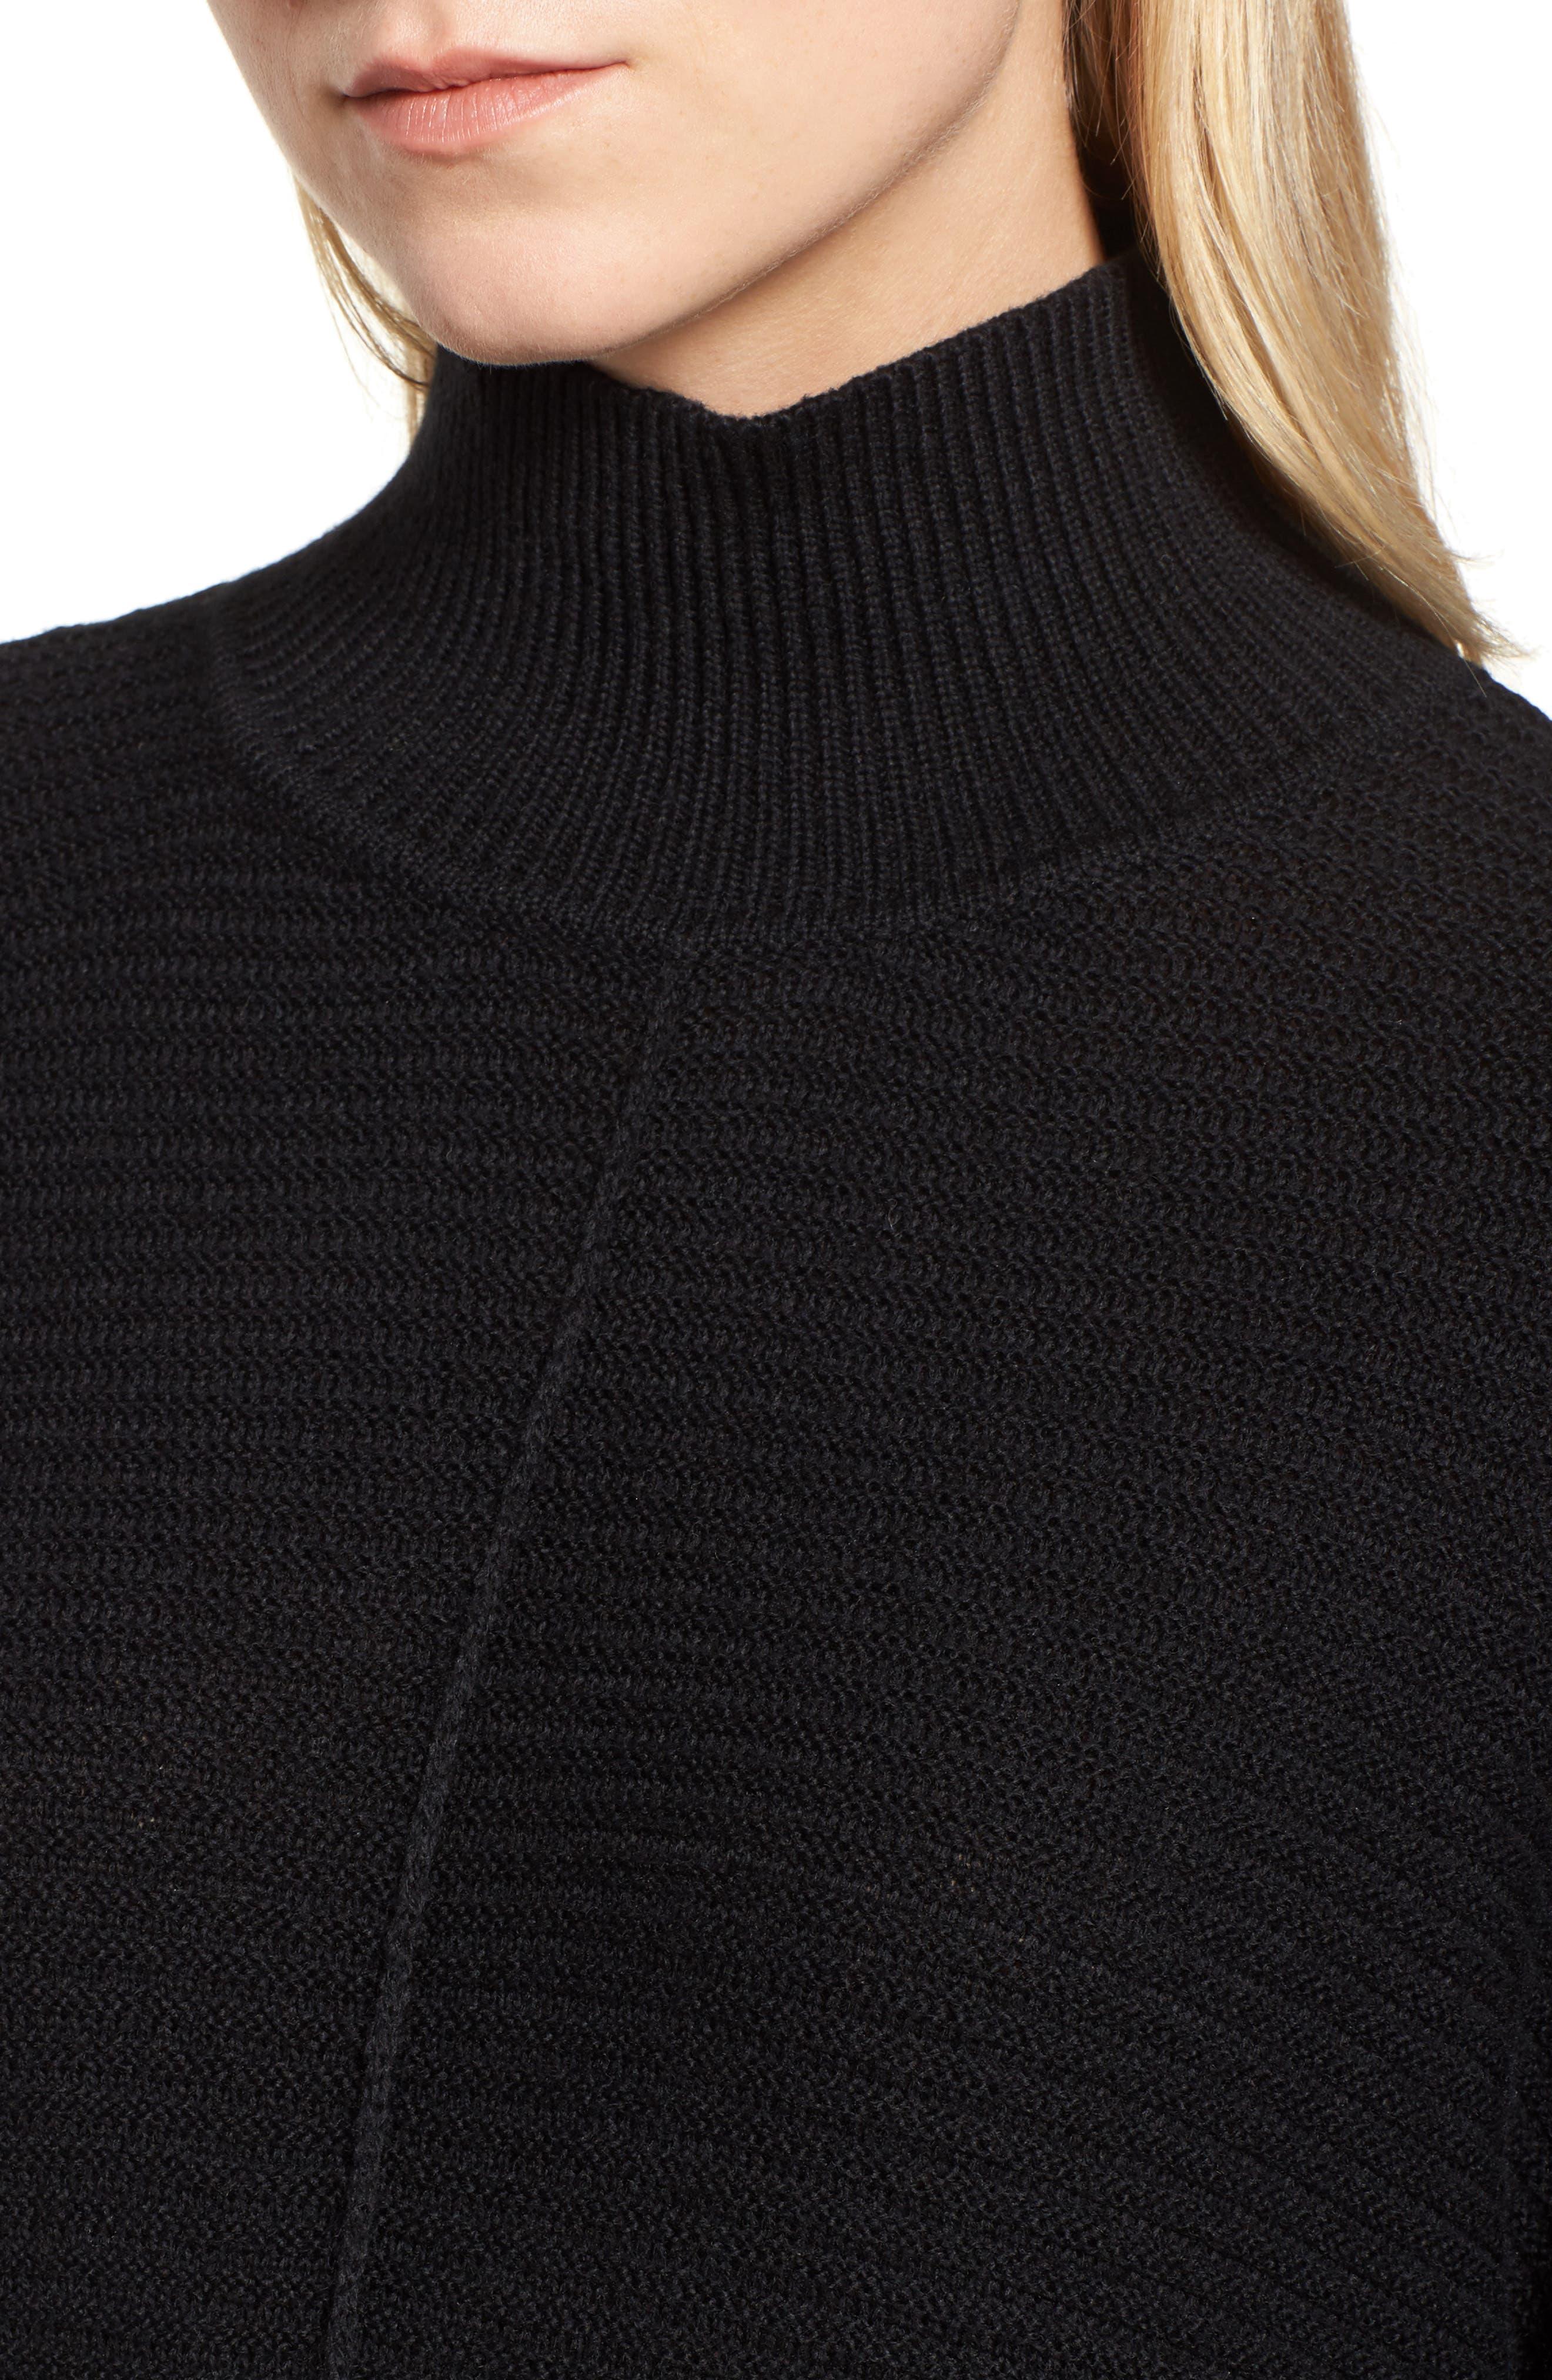 Ribbed Turtleneck Tunic Sweater,                             Alternate thumbnail 4, color,                             BLACK